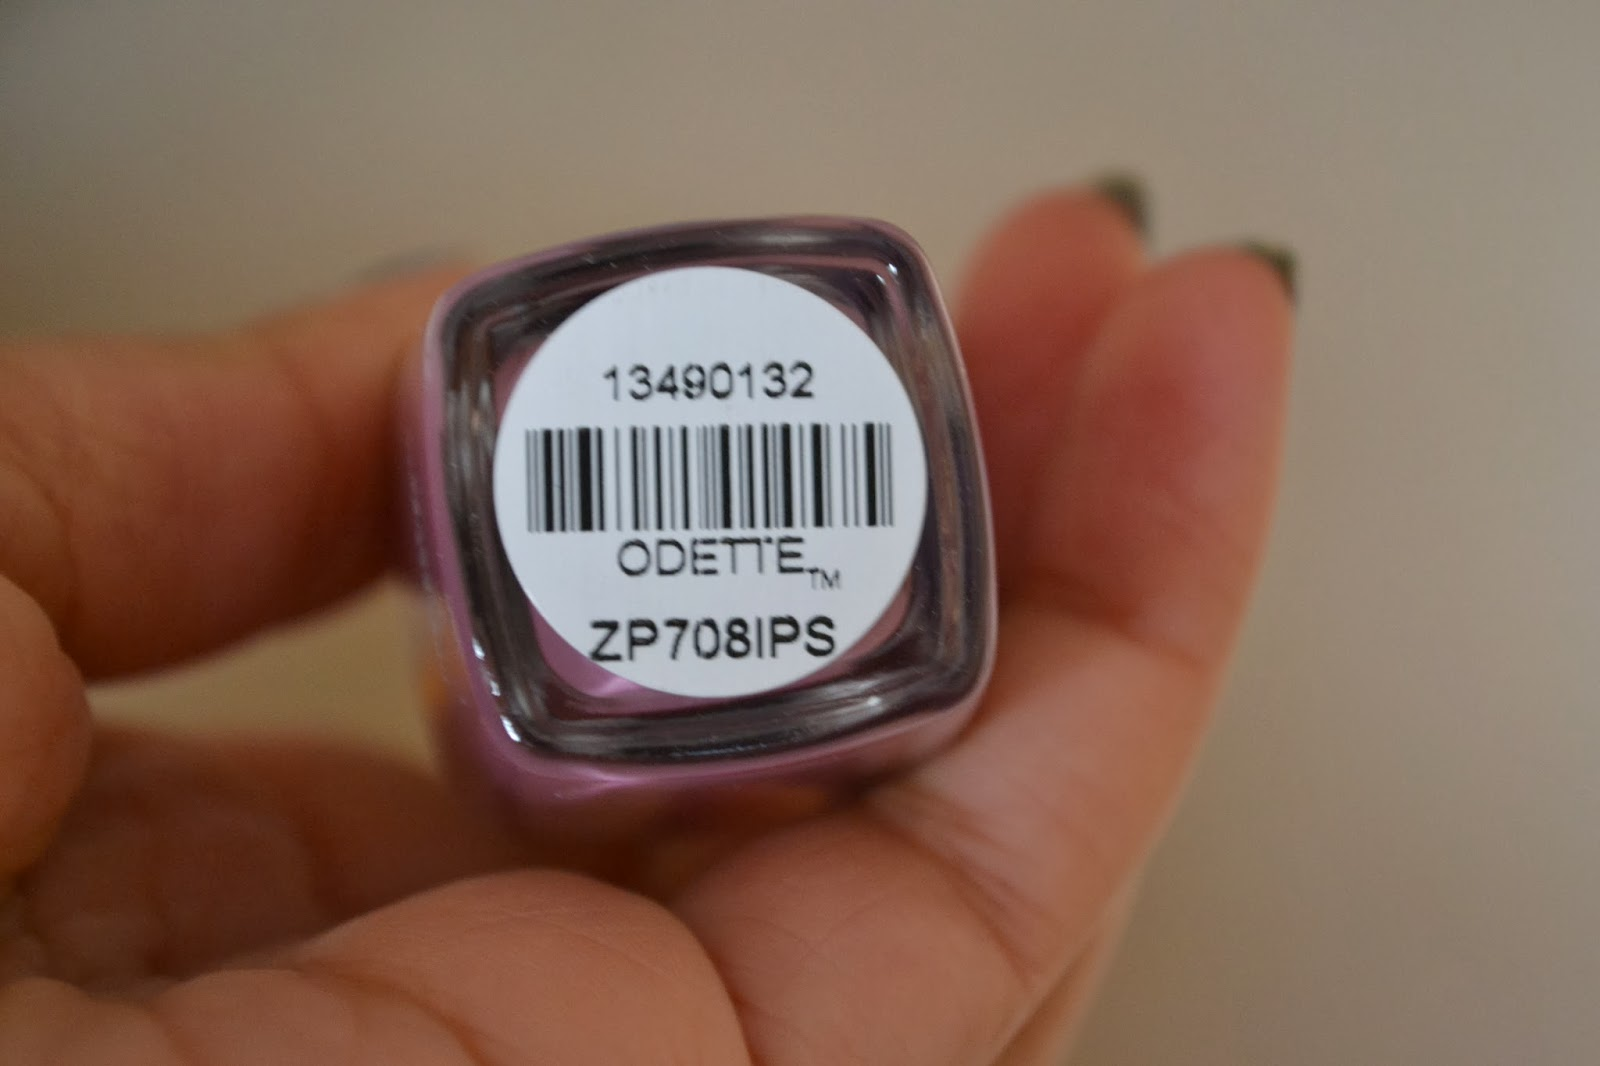 Zoya nail polish in the shade Odette